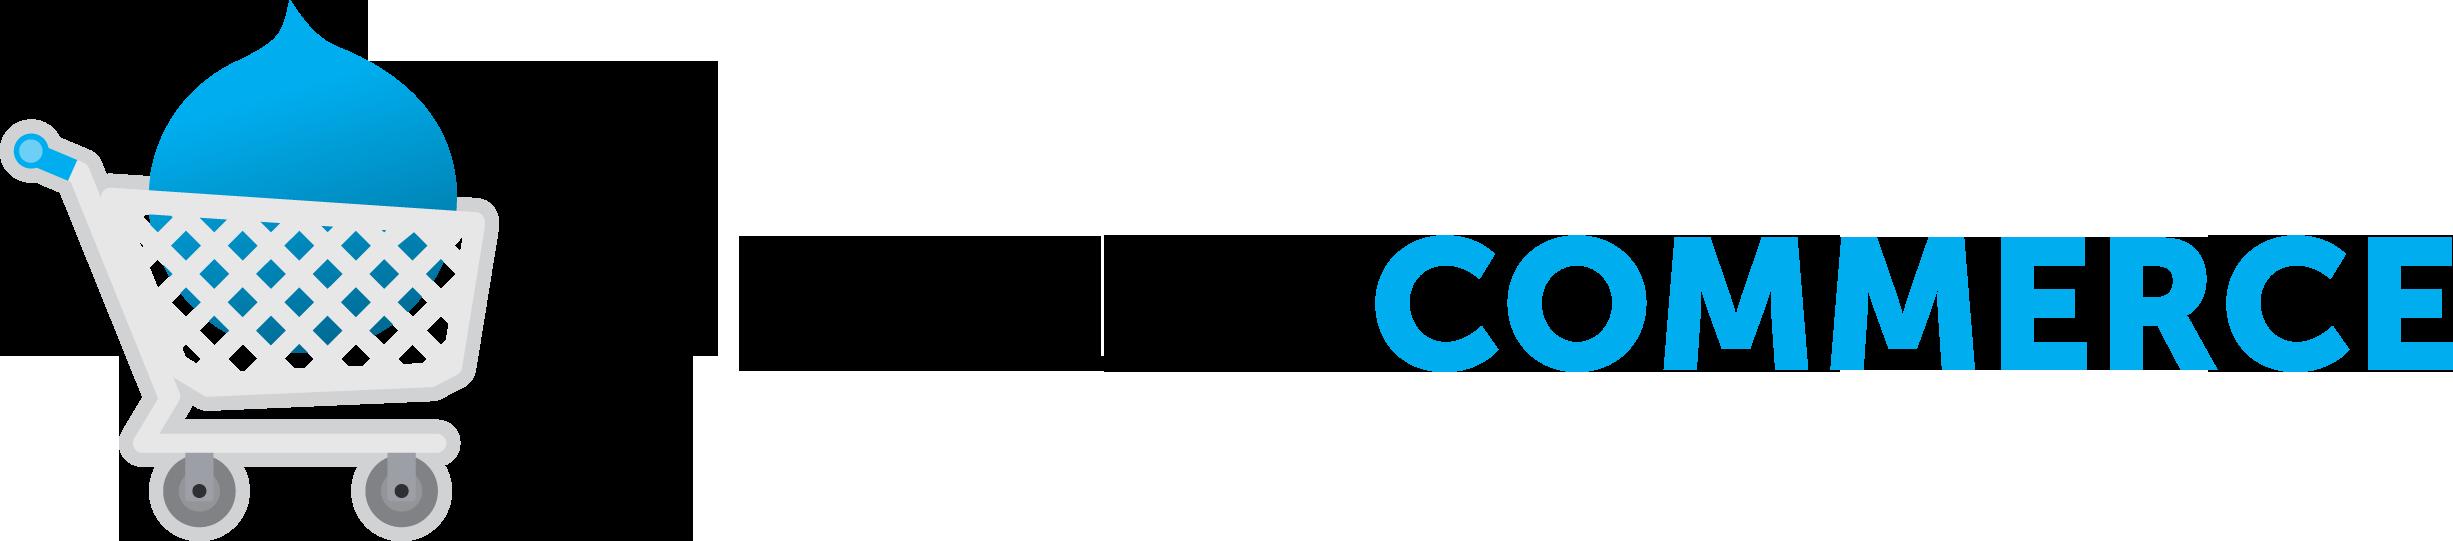 Drupal Commerce Marketing Resources   Drupal Commerce